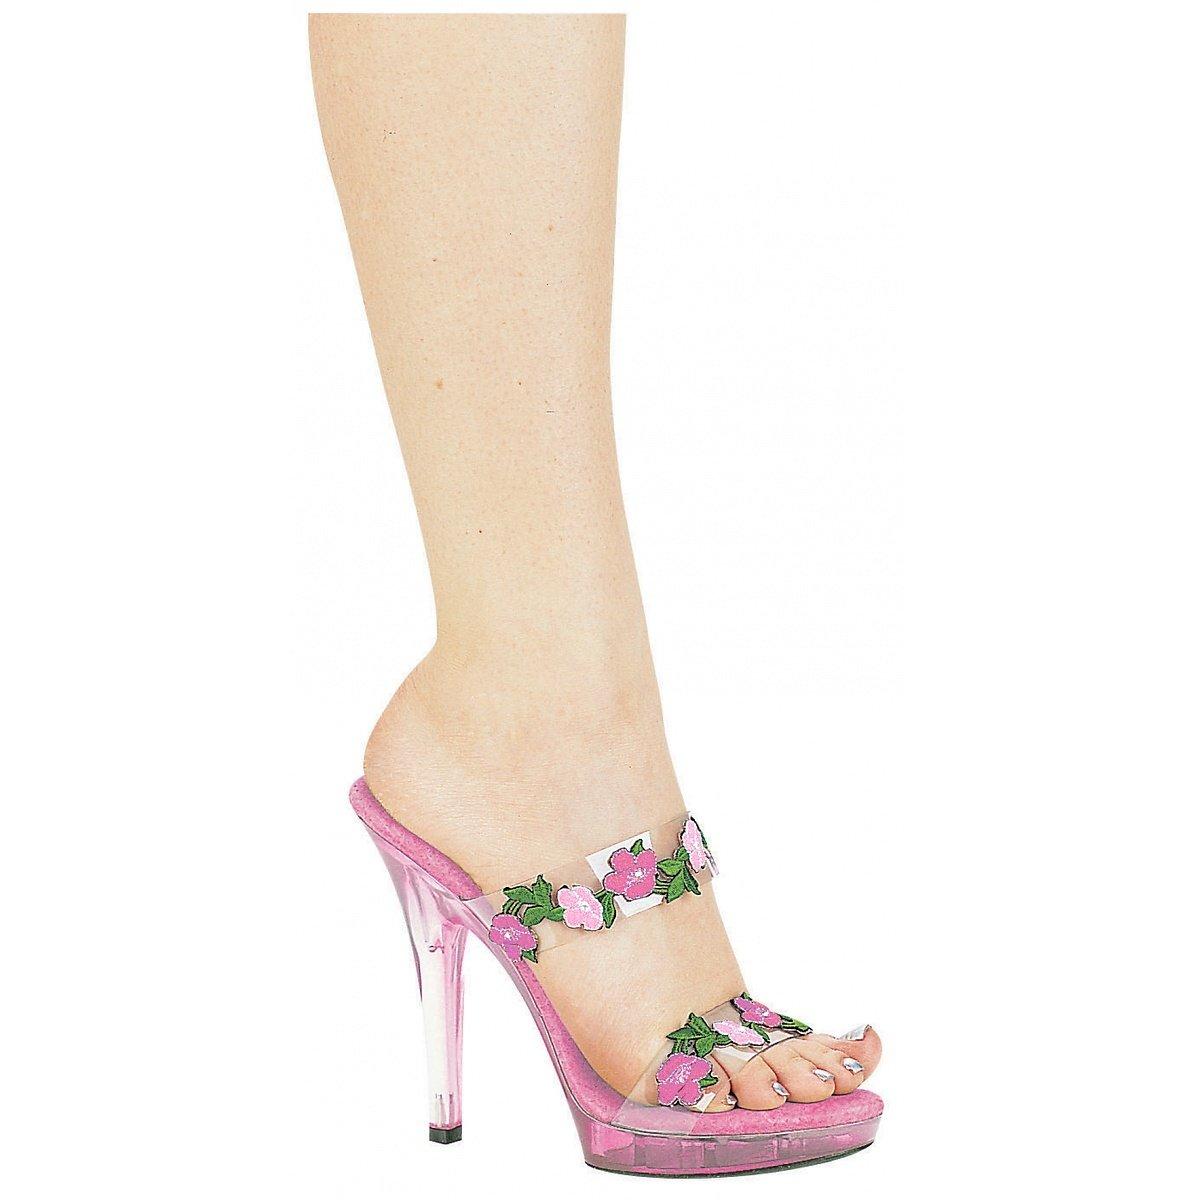 Amazon Ellie Shoes 5 Heel Flower Sandal Heeled Sandals